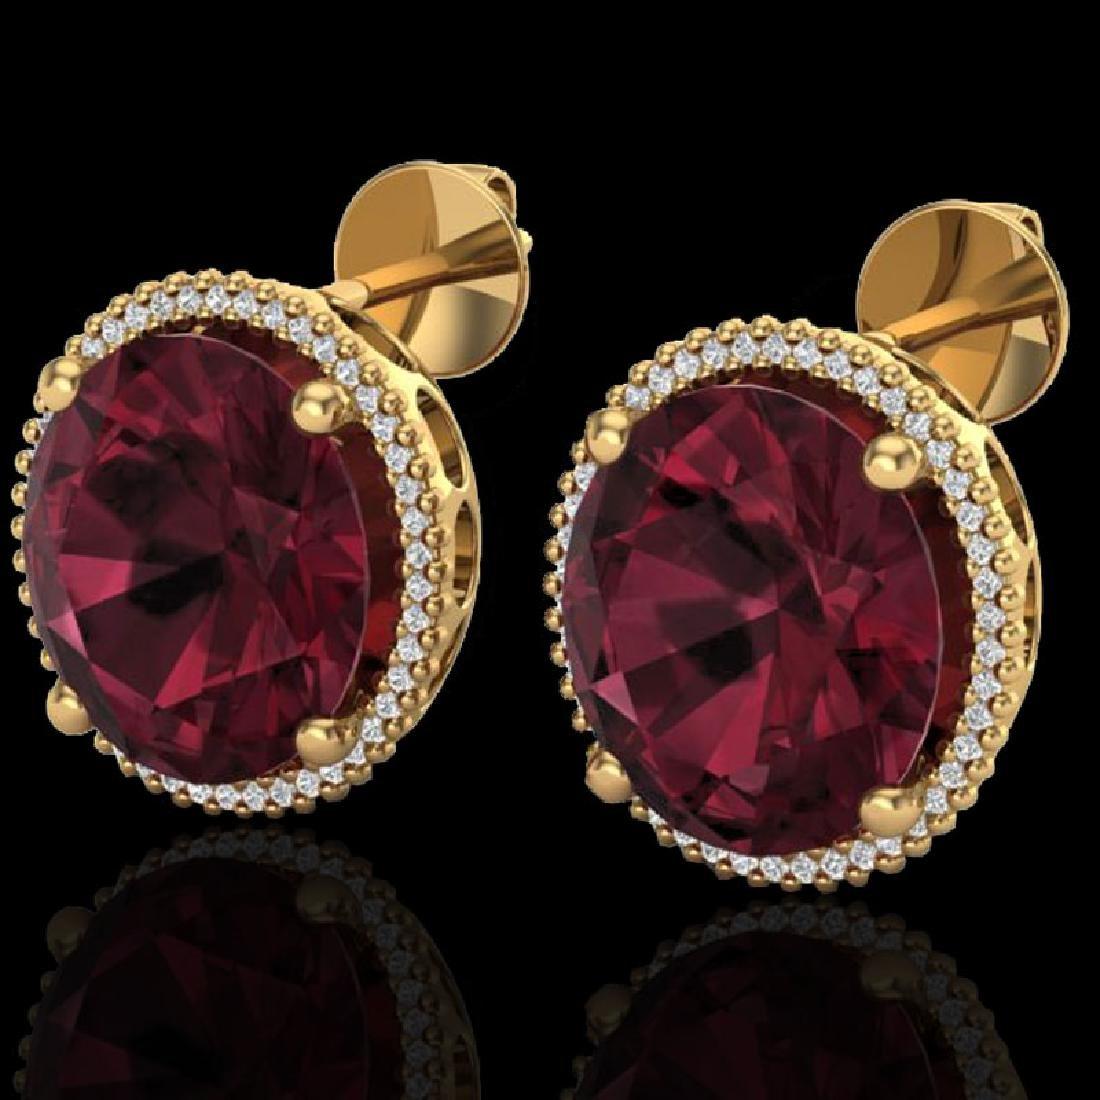 20 CTW Garnet & Micro Pave VS/SI Diamond Halo Earrings